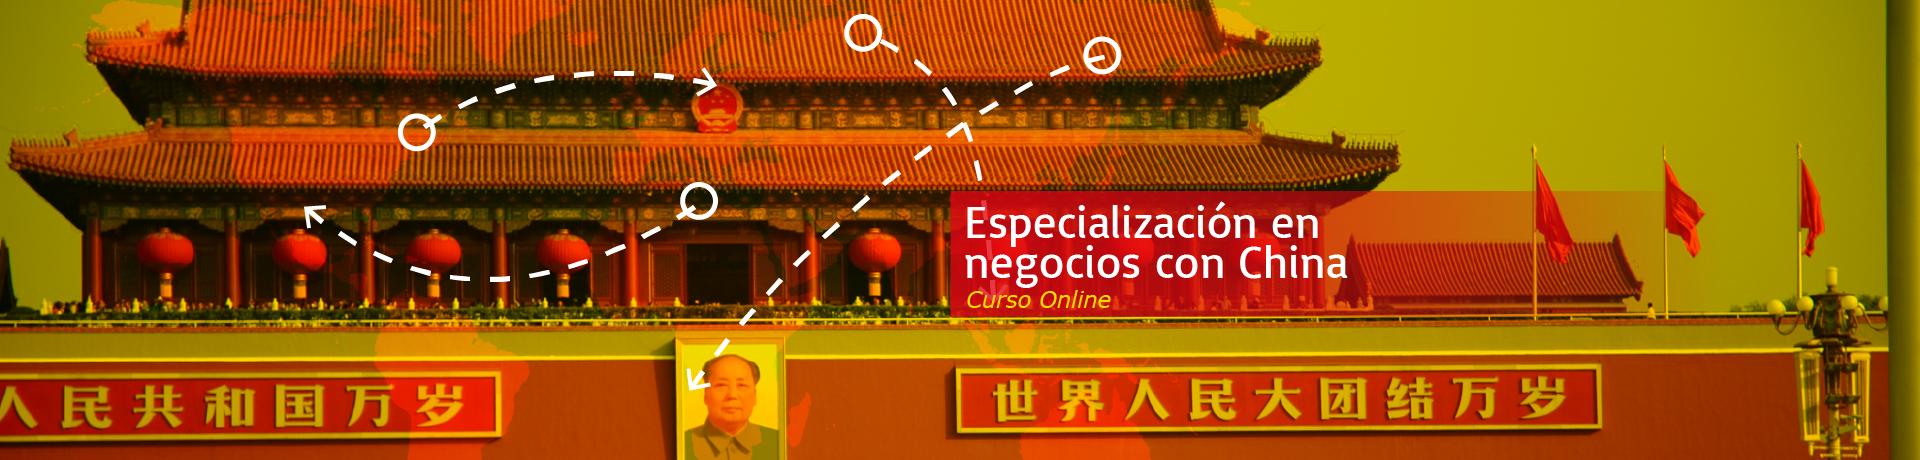 Capacitate sobre China